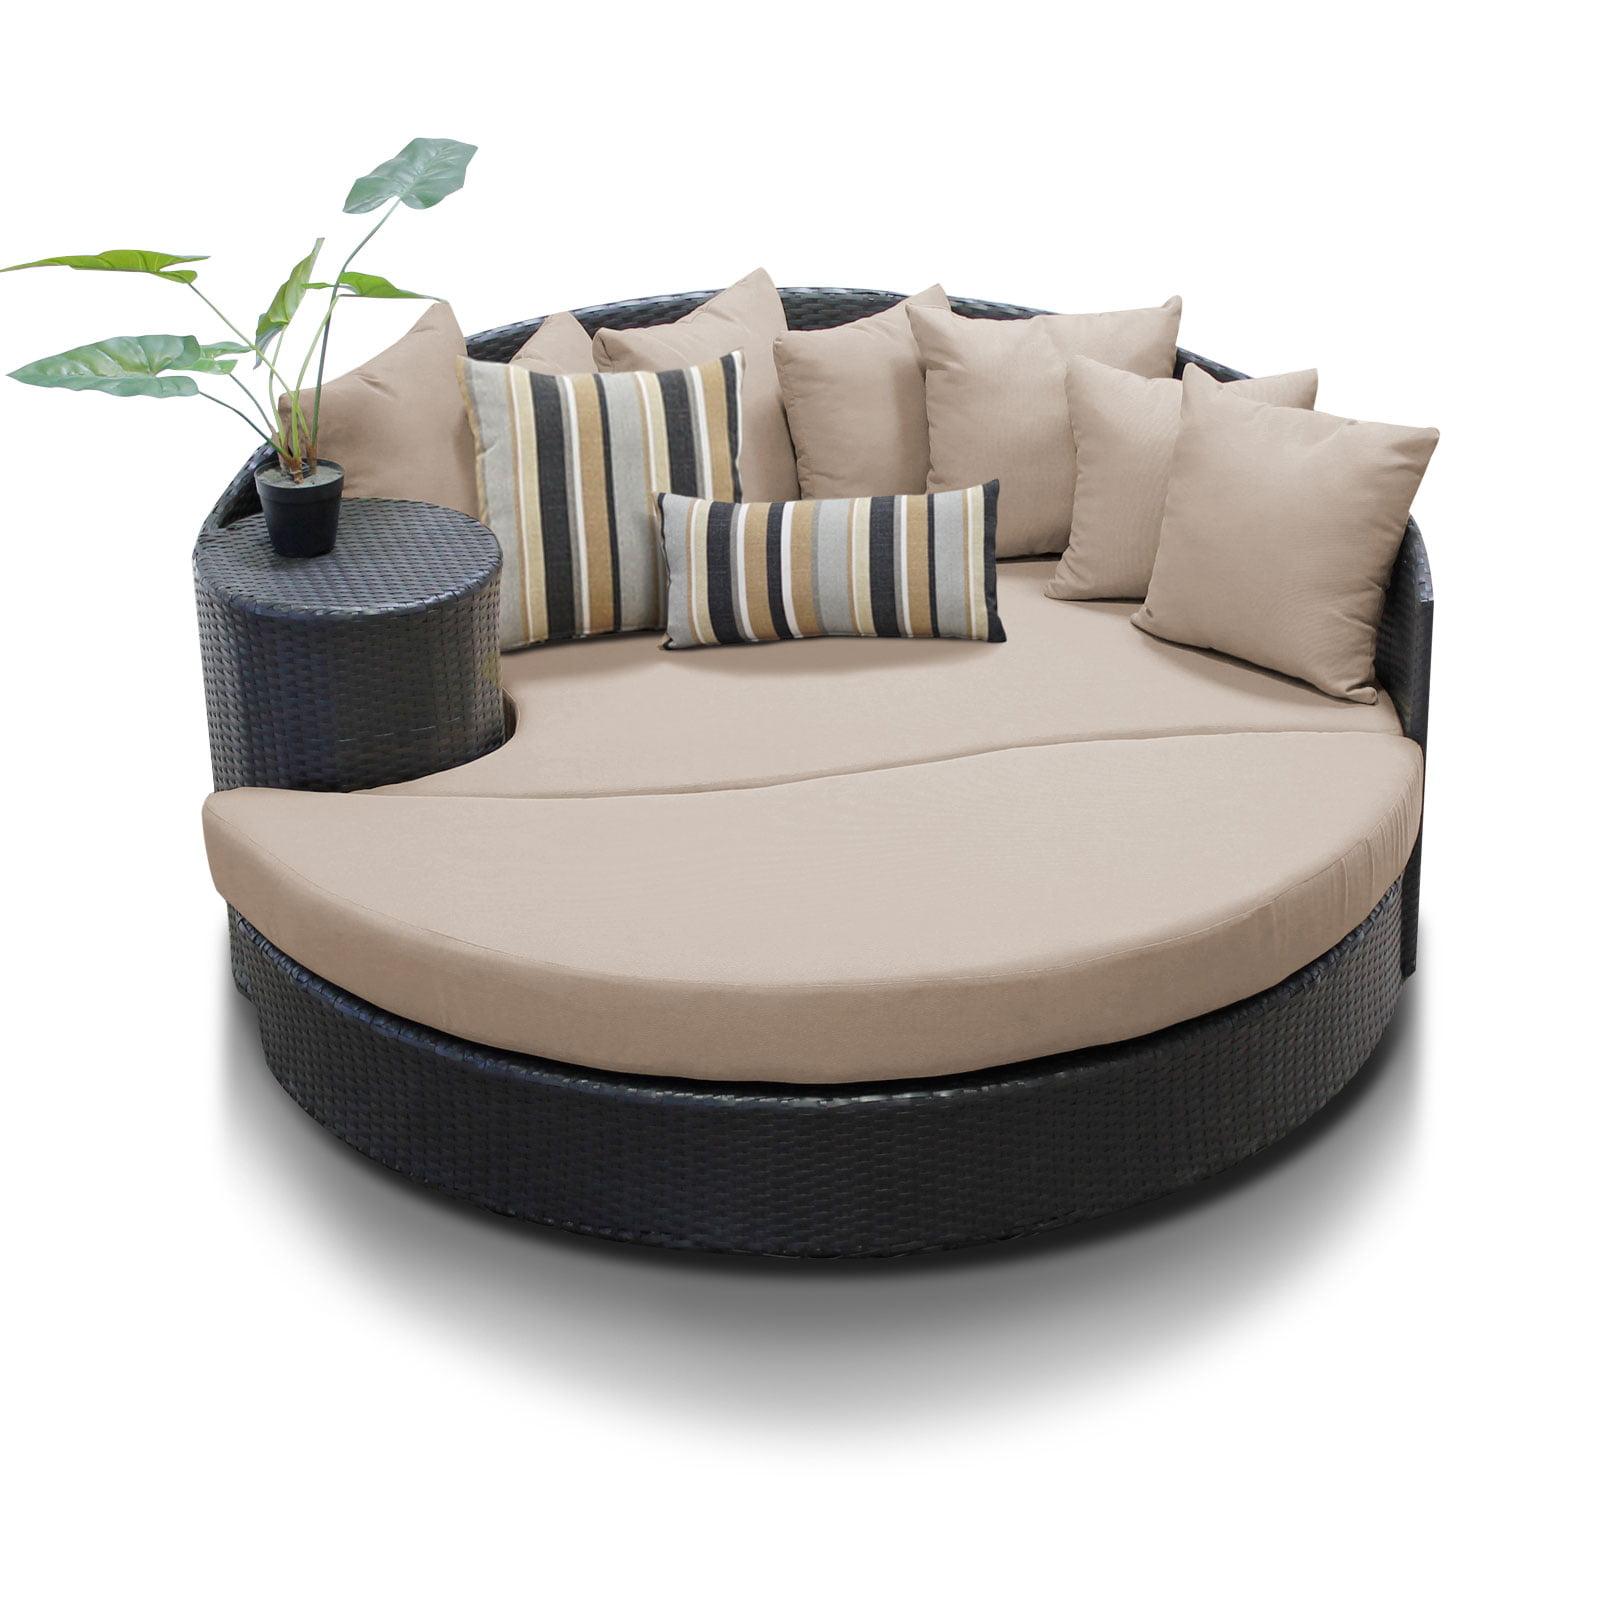 Zen Circular Sun Bed Outdoor Wicker Patio Furniture by TK Classics